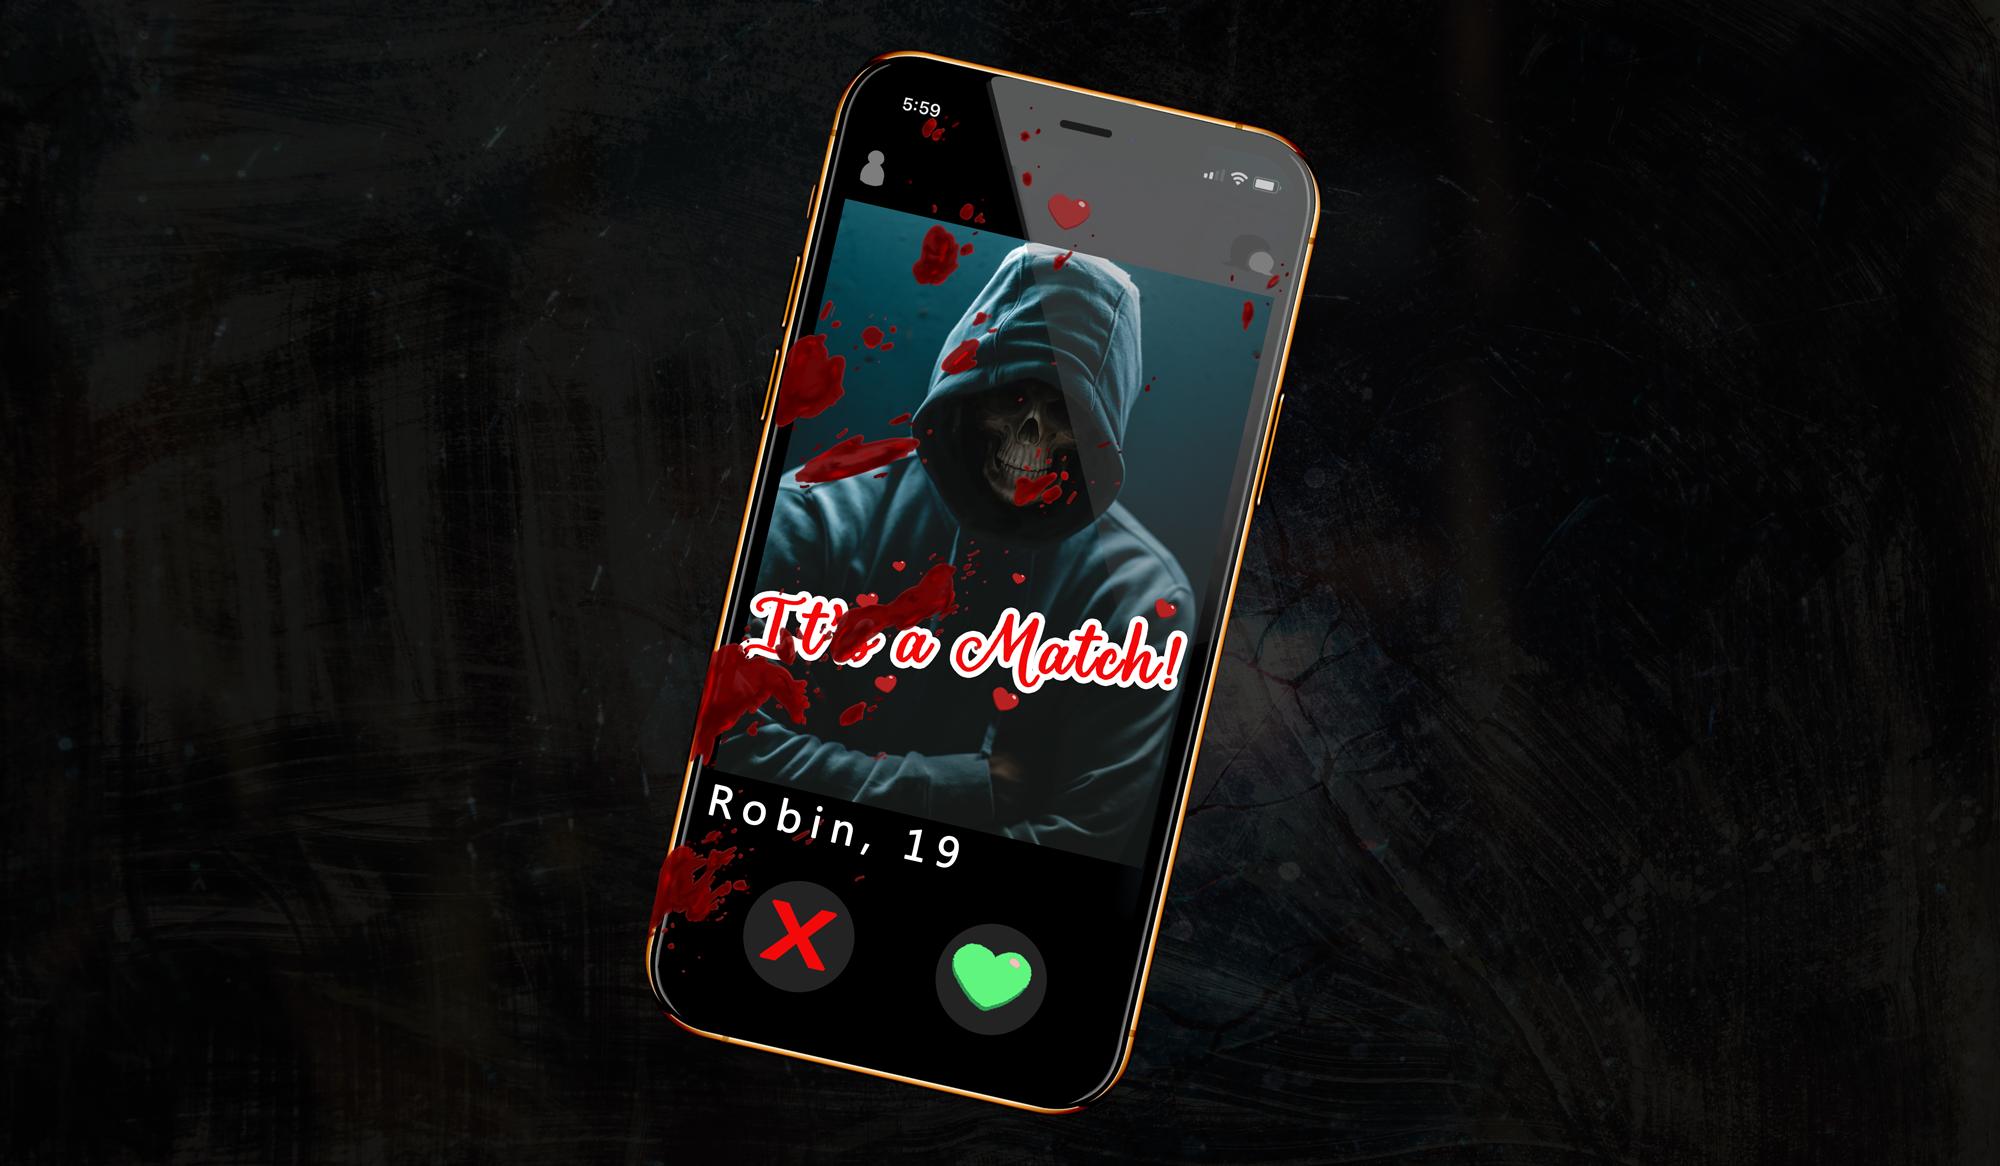 Dating App Concept image. Psycho-Swipe.